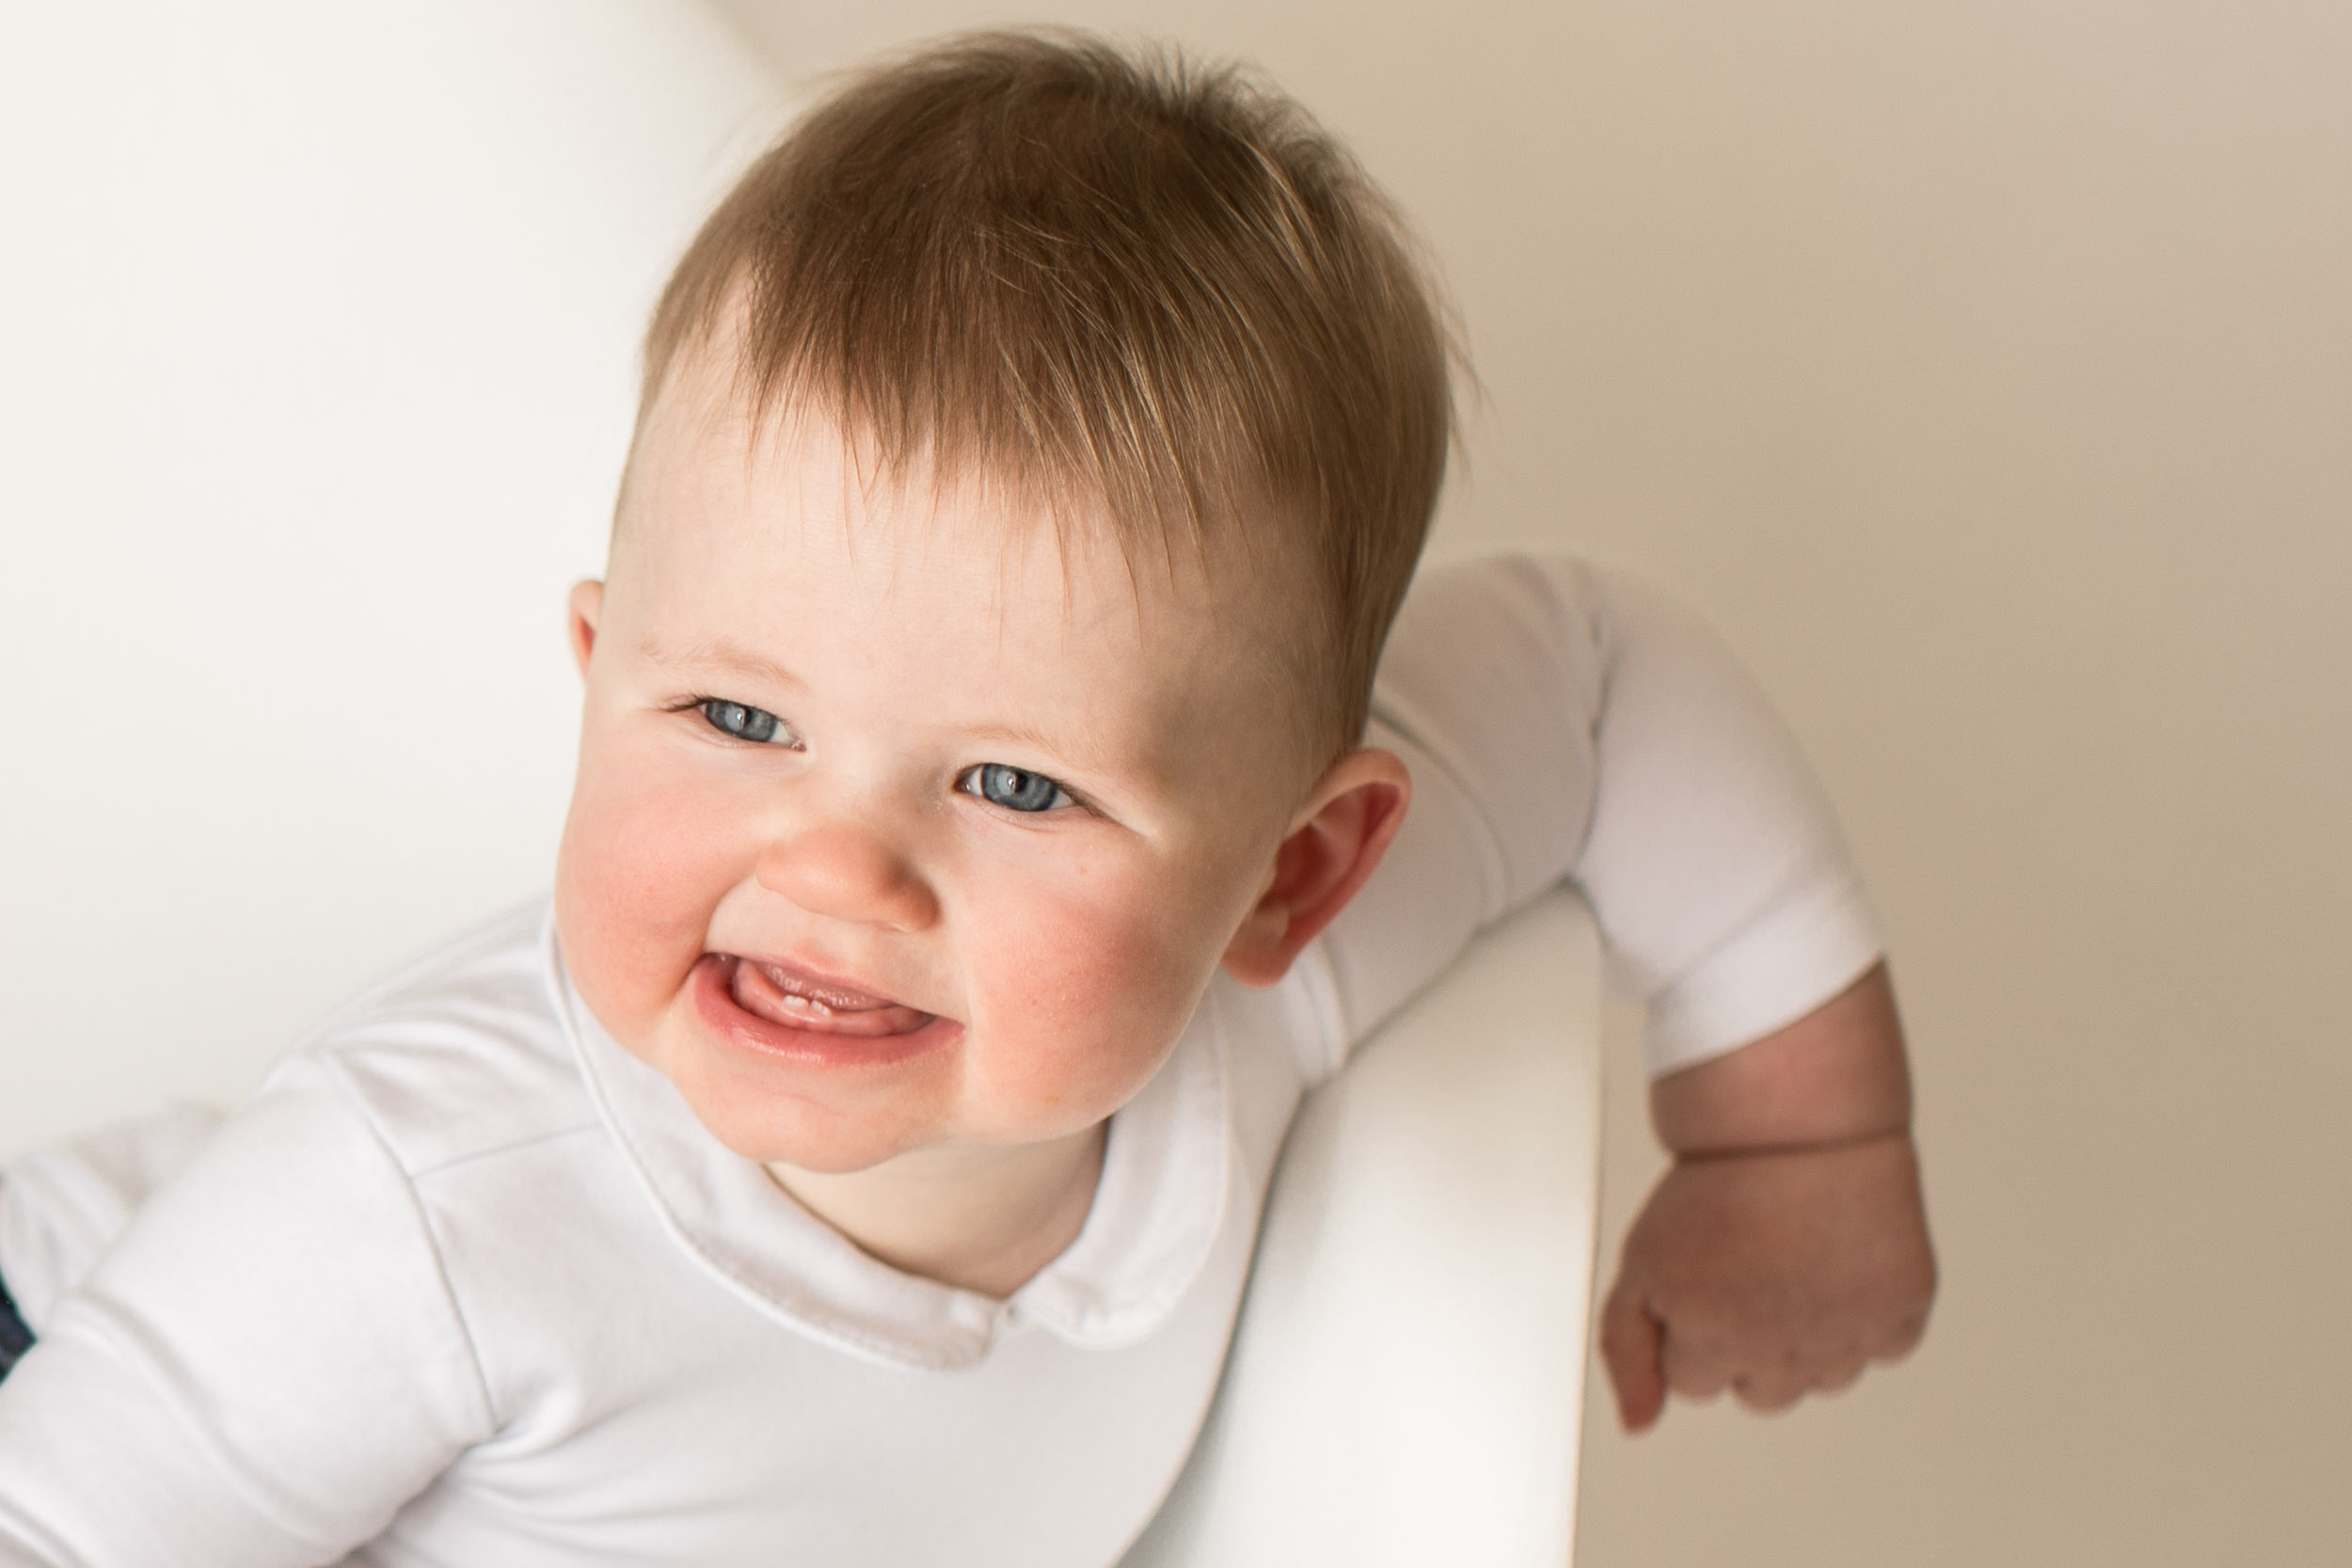 NYC_baby_portraits_UWS_John-12.jpg